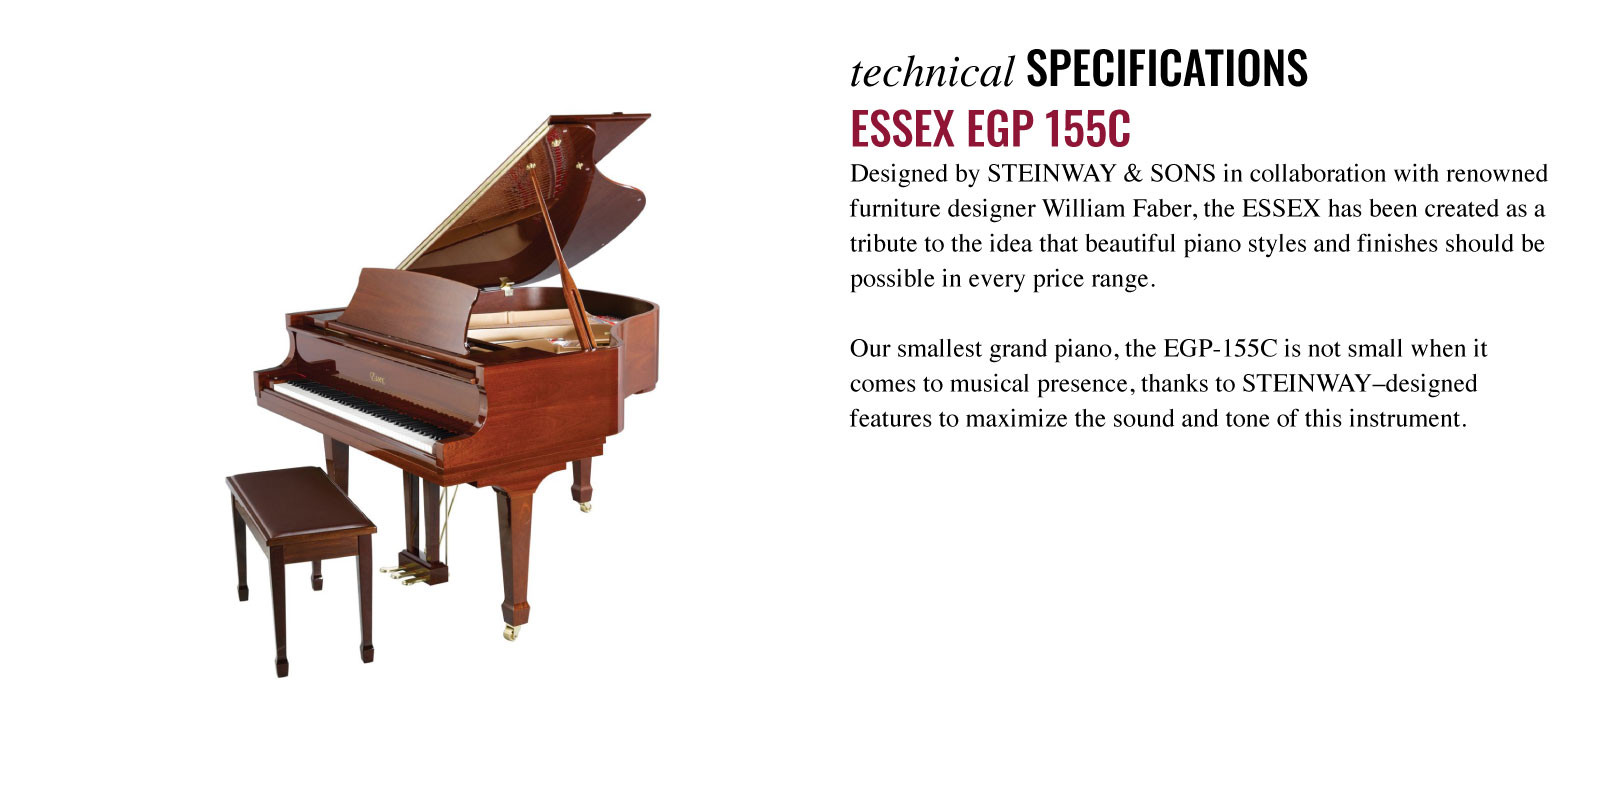 PP-Essex-EGP-155C-Details-1.jpg